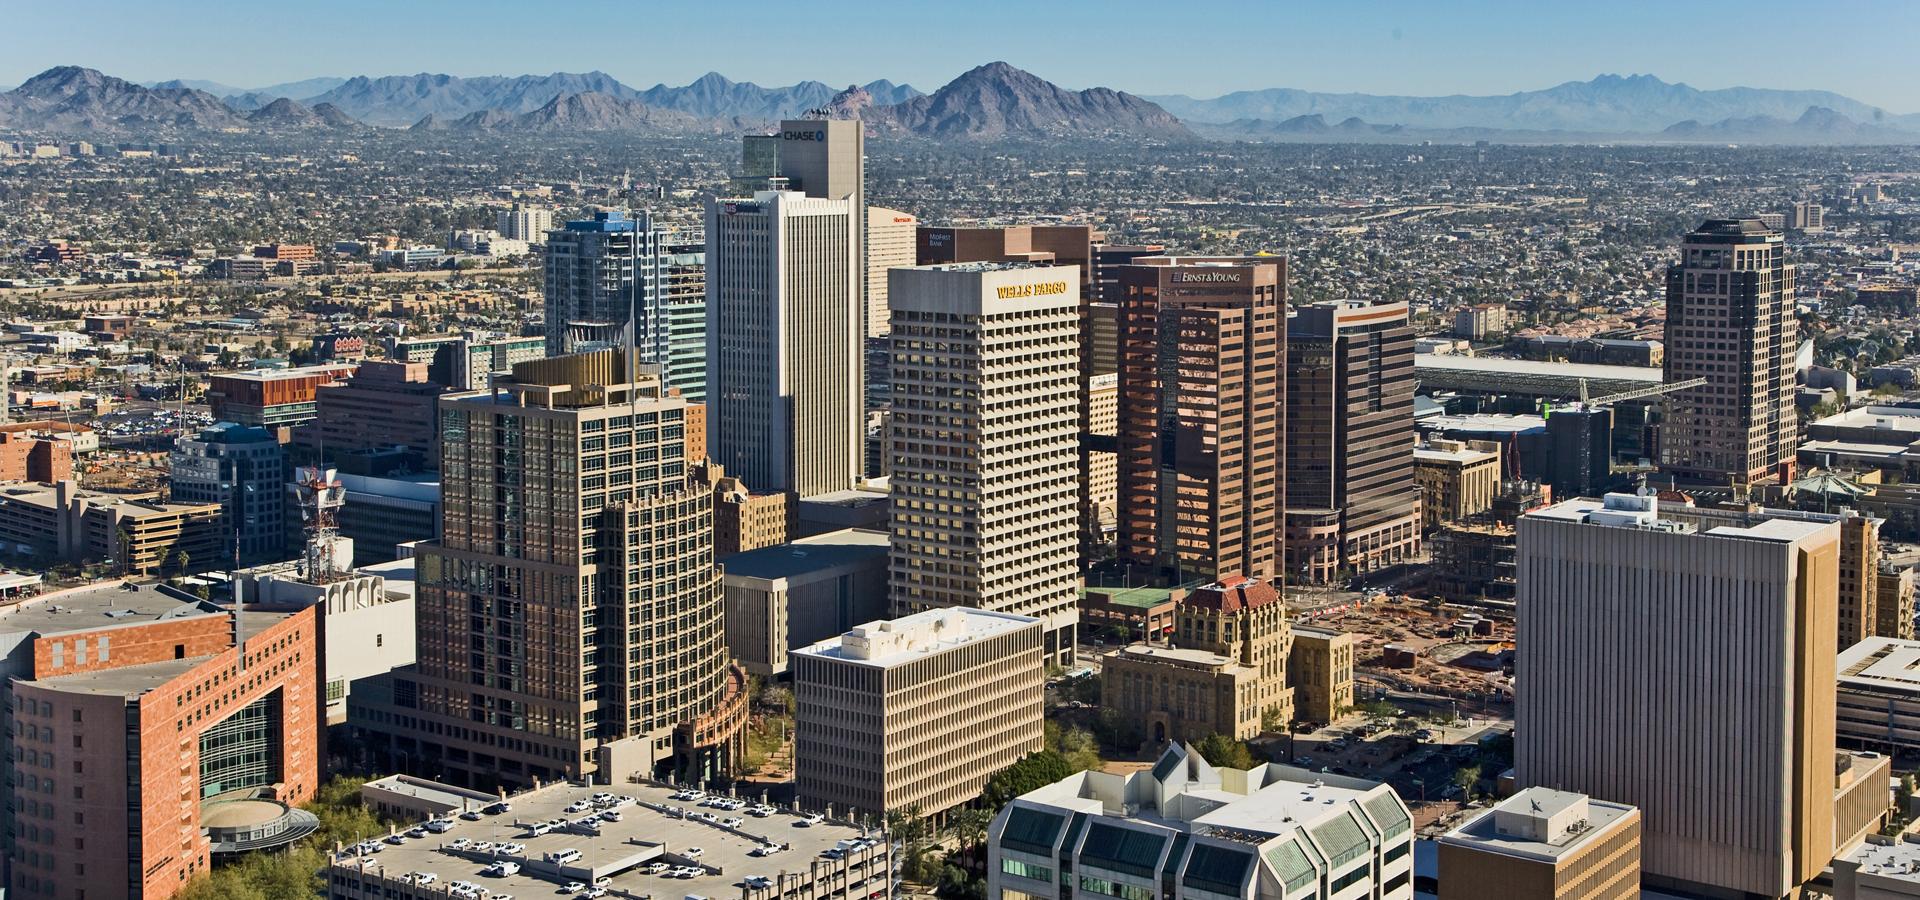 <b>Phoenix, Arizona, USA</b>